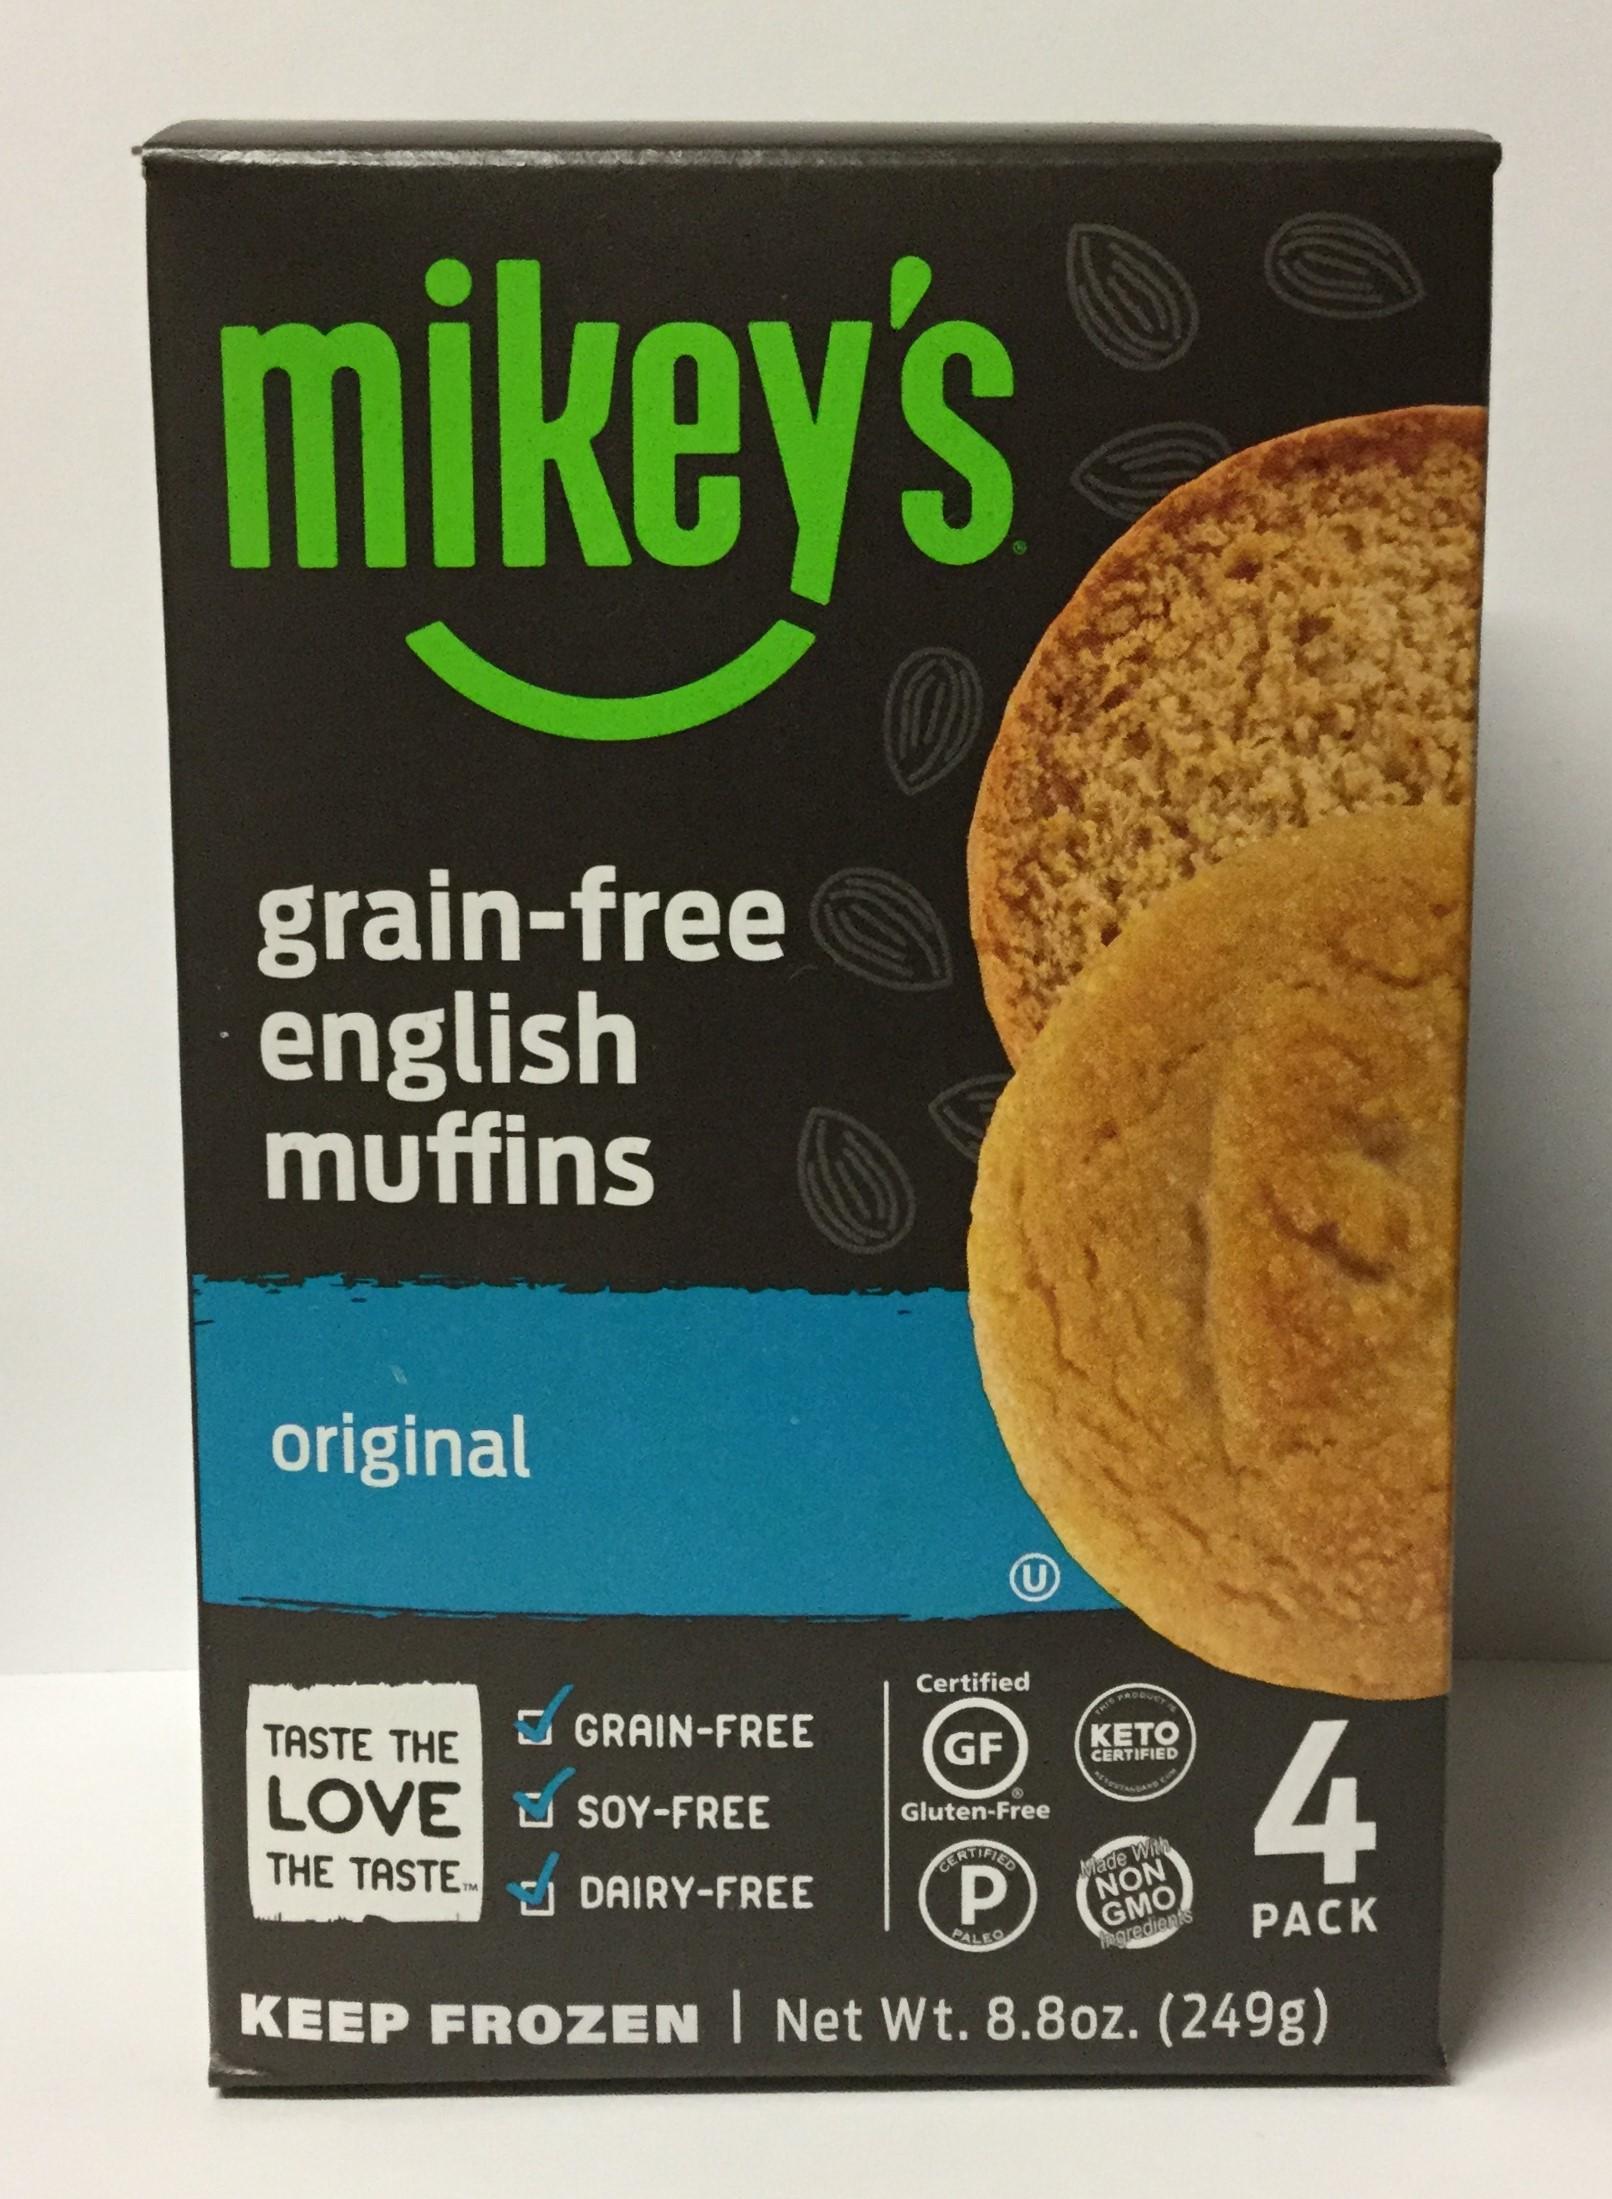 MIKEY'S Grain-Free English Muffins - 4pk